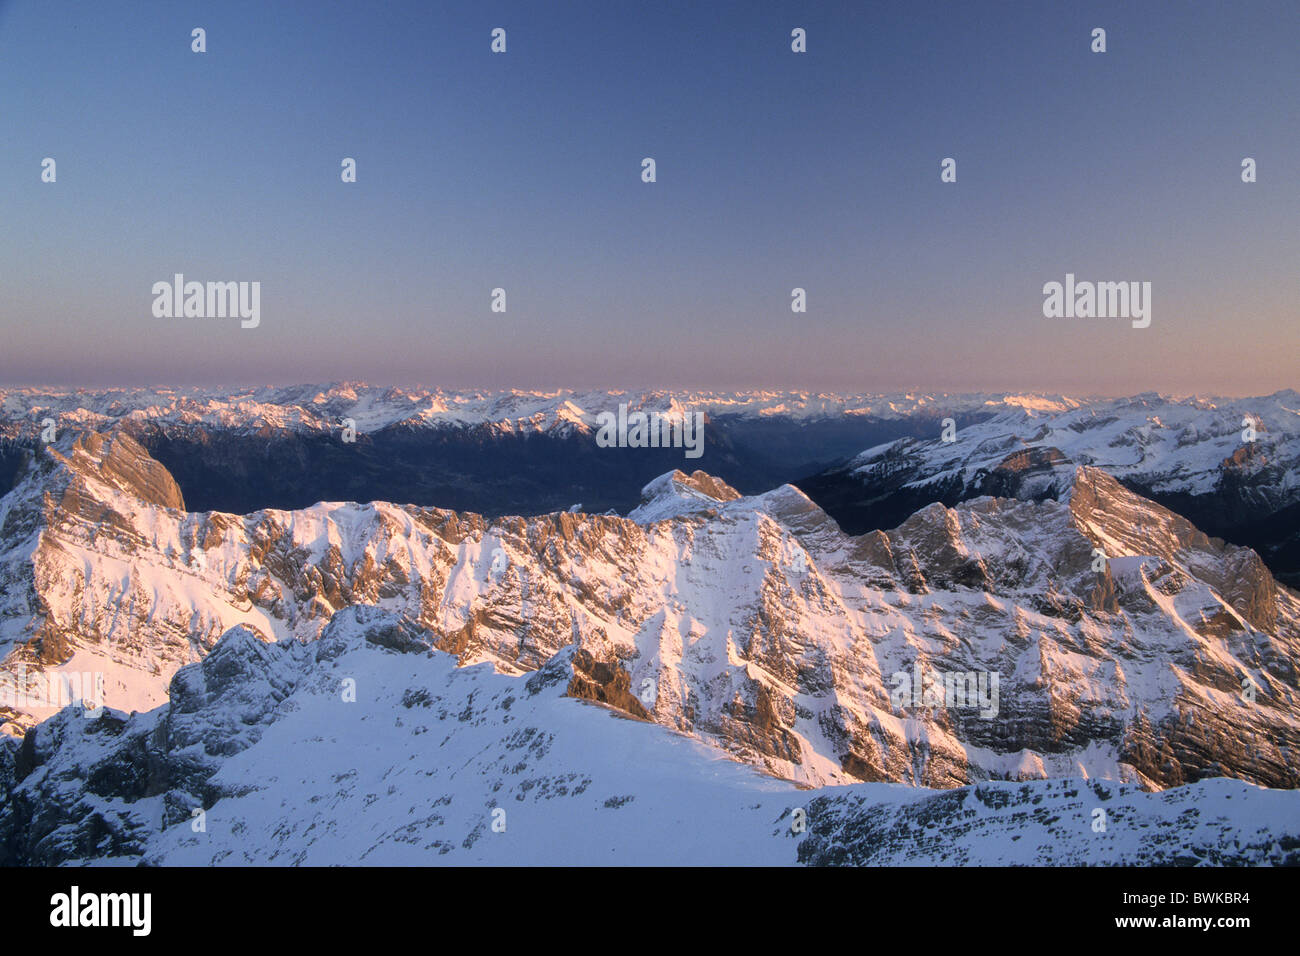 Schweiz Europa Alpen Berge Bergmassiv Alpstein Stimmung Dämmerung Twilight Schnee Landschaft Landschaft Alpst Stockbild